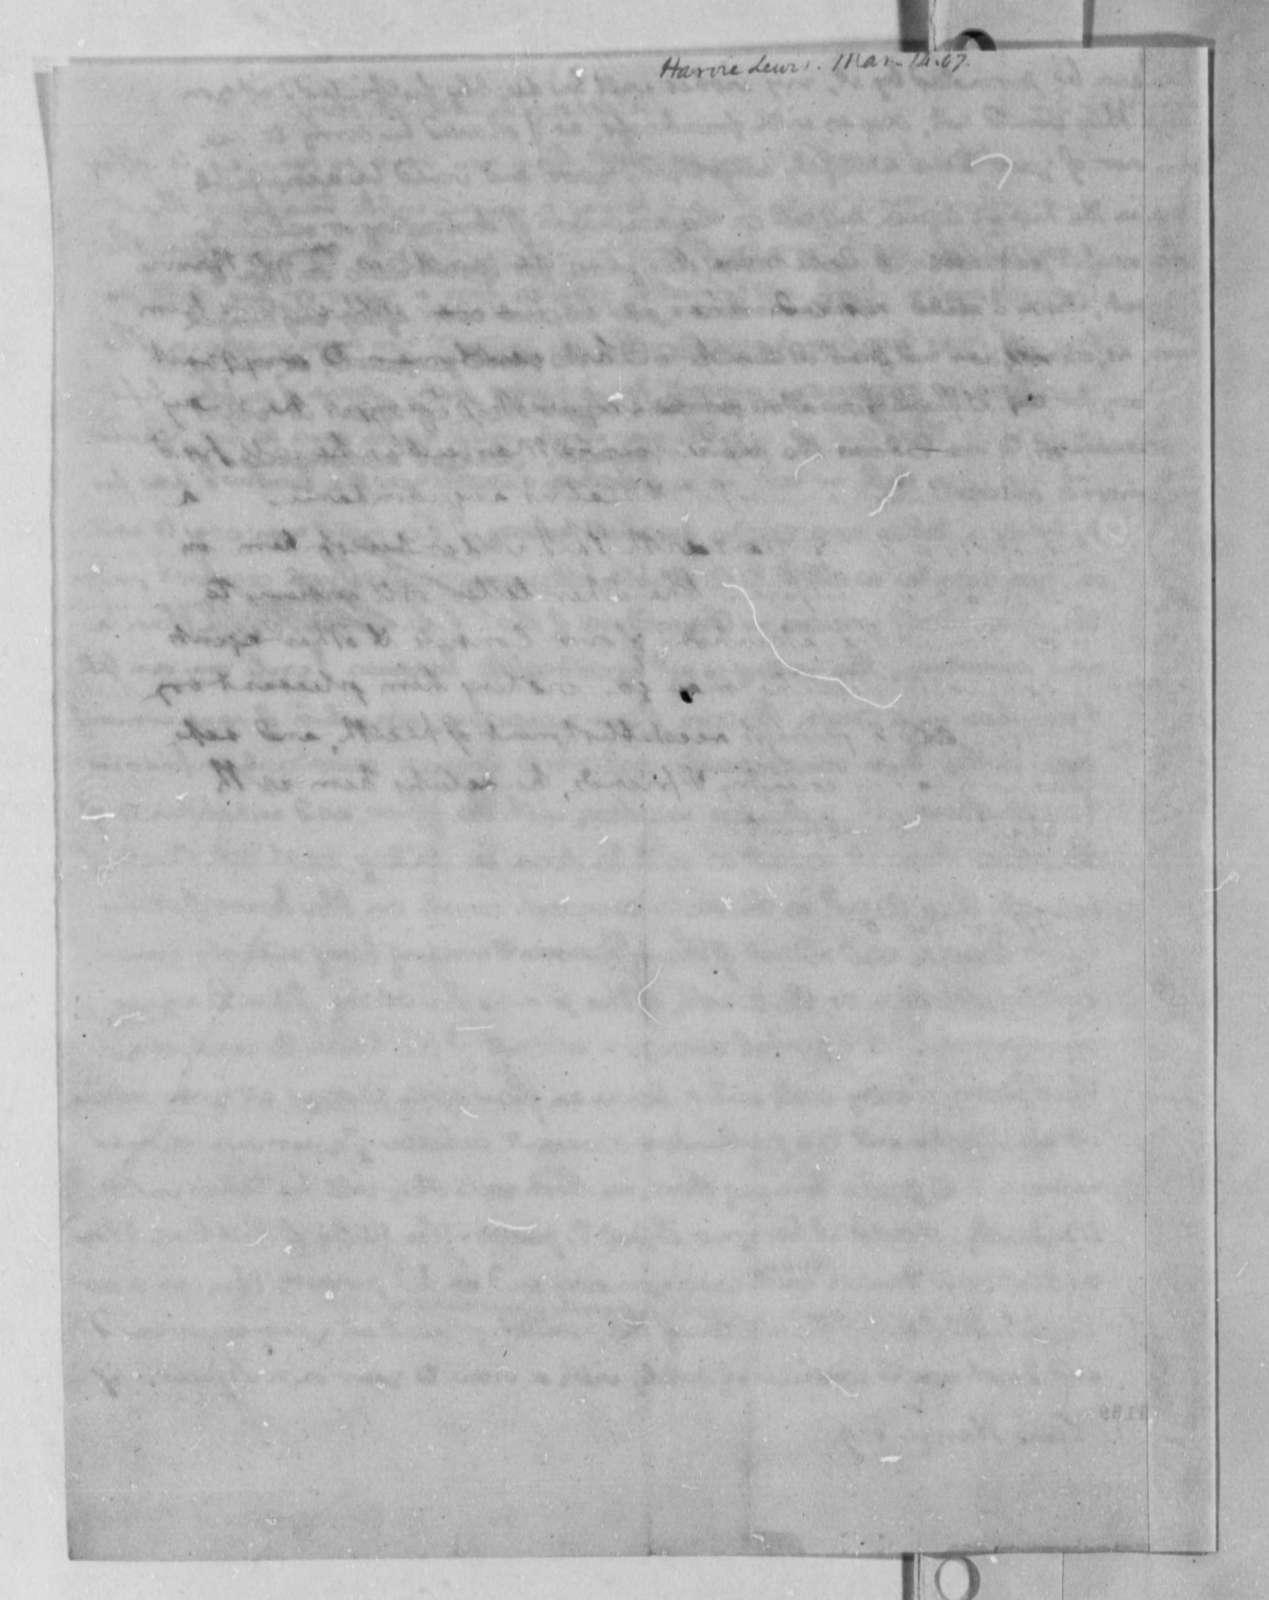 Thomas Jefferson to Lewis Harvie, March 14, 1807